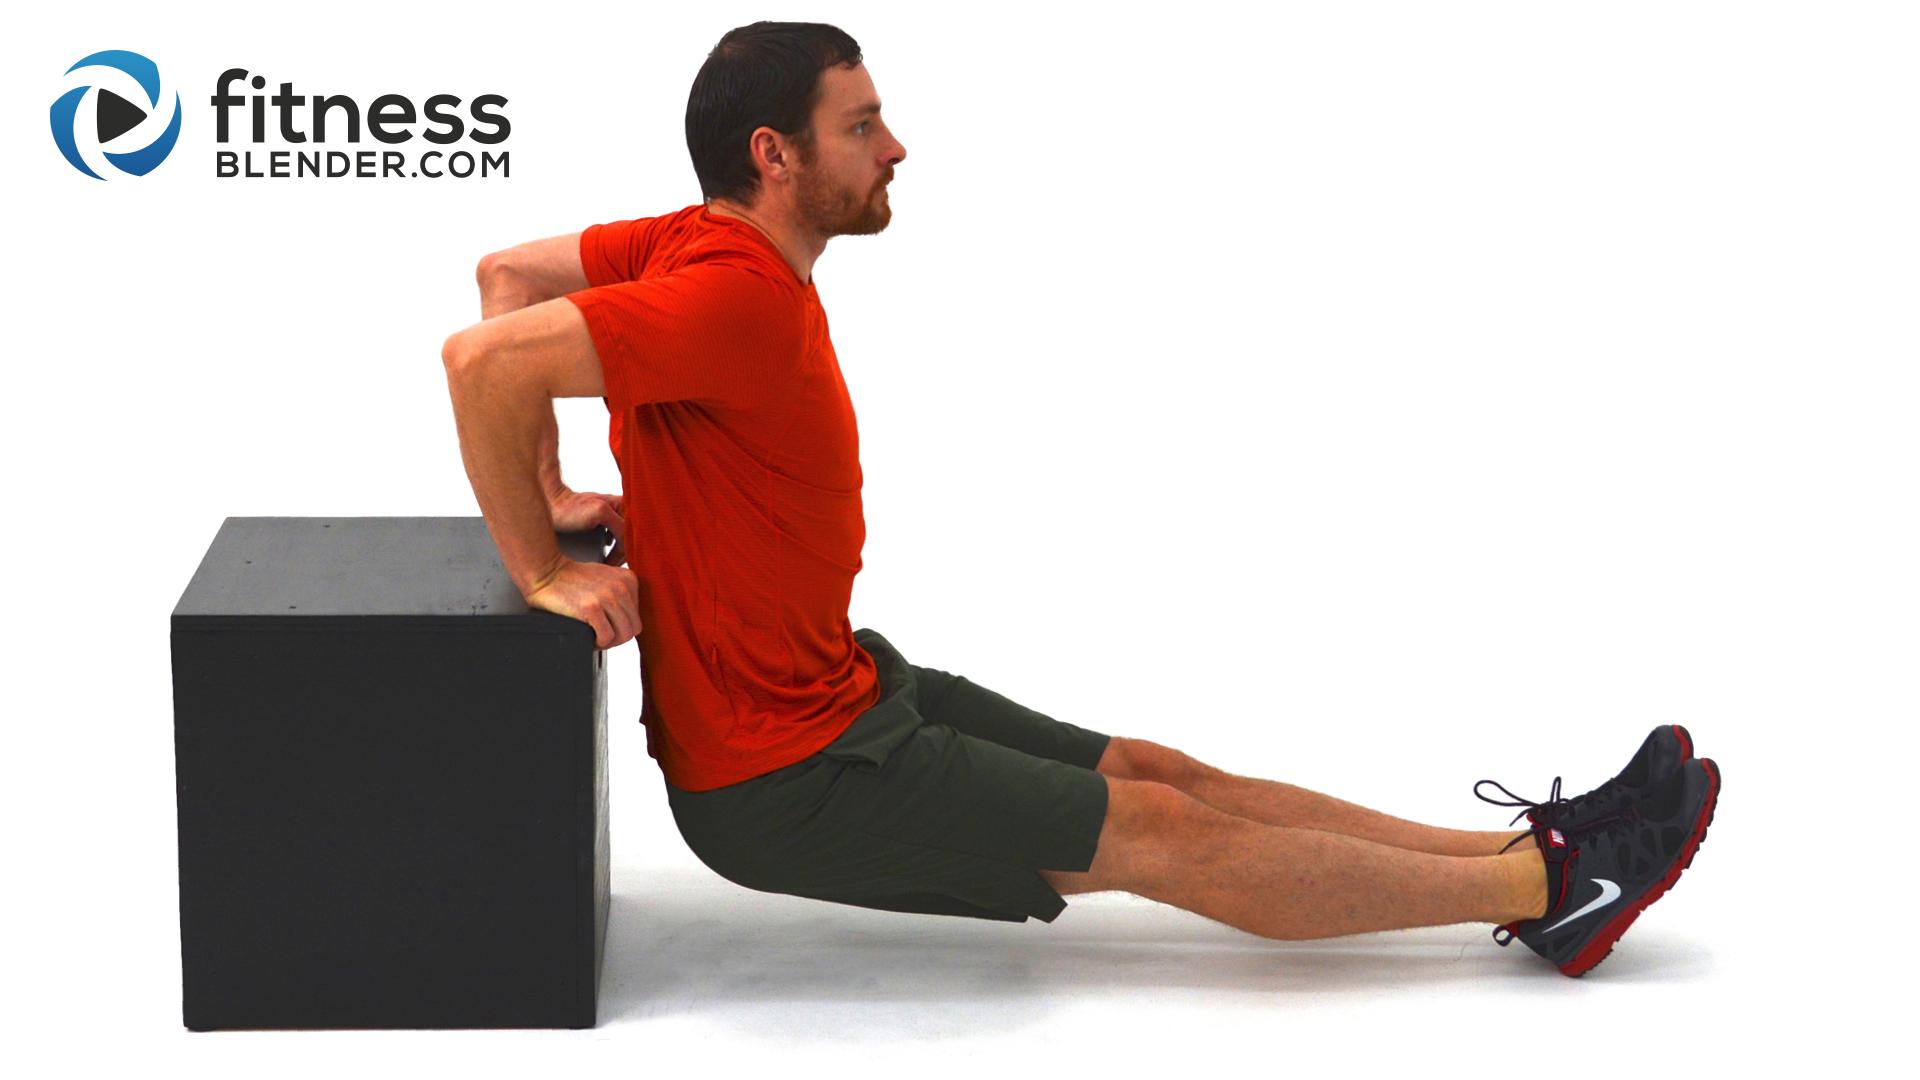 Upper Body Strength Gym Exercises - The Gym